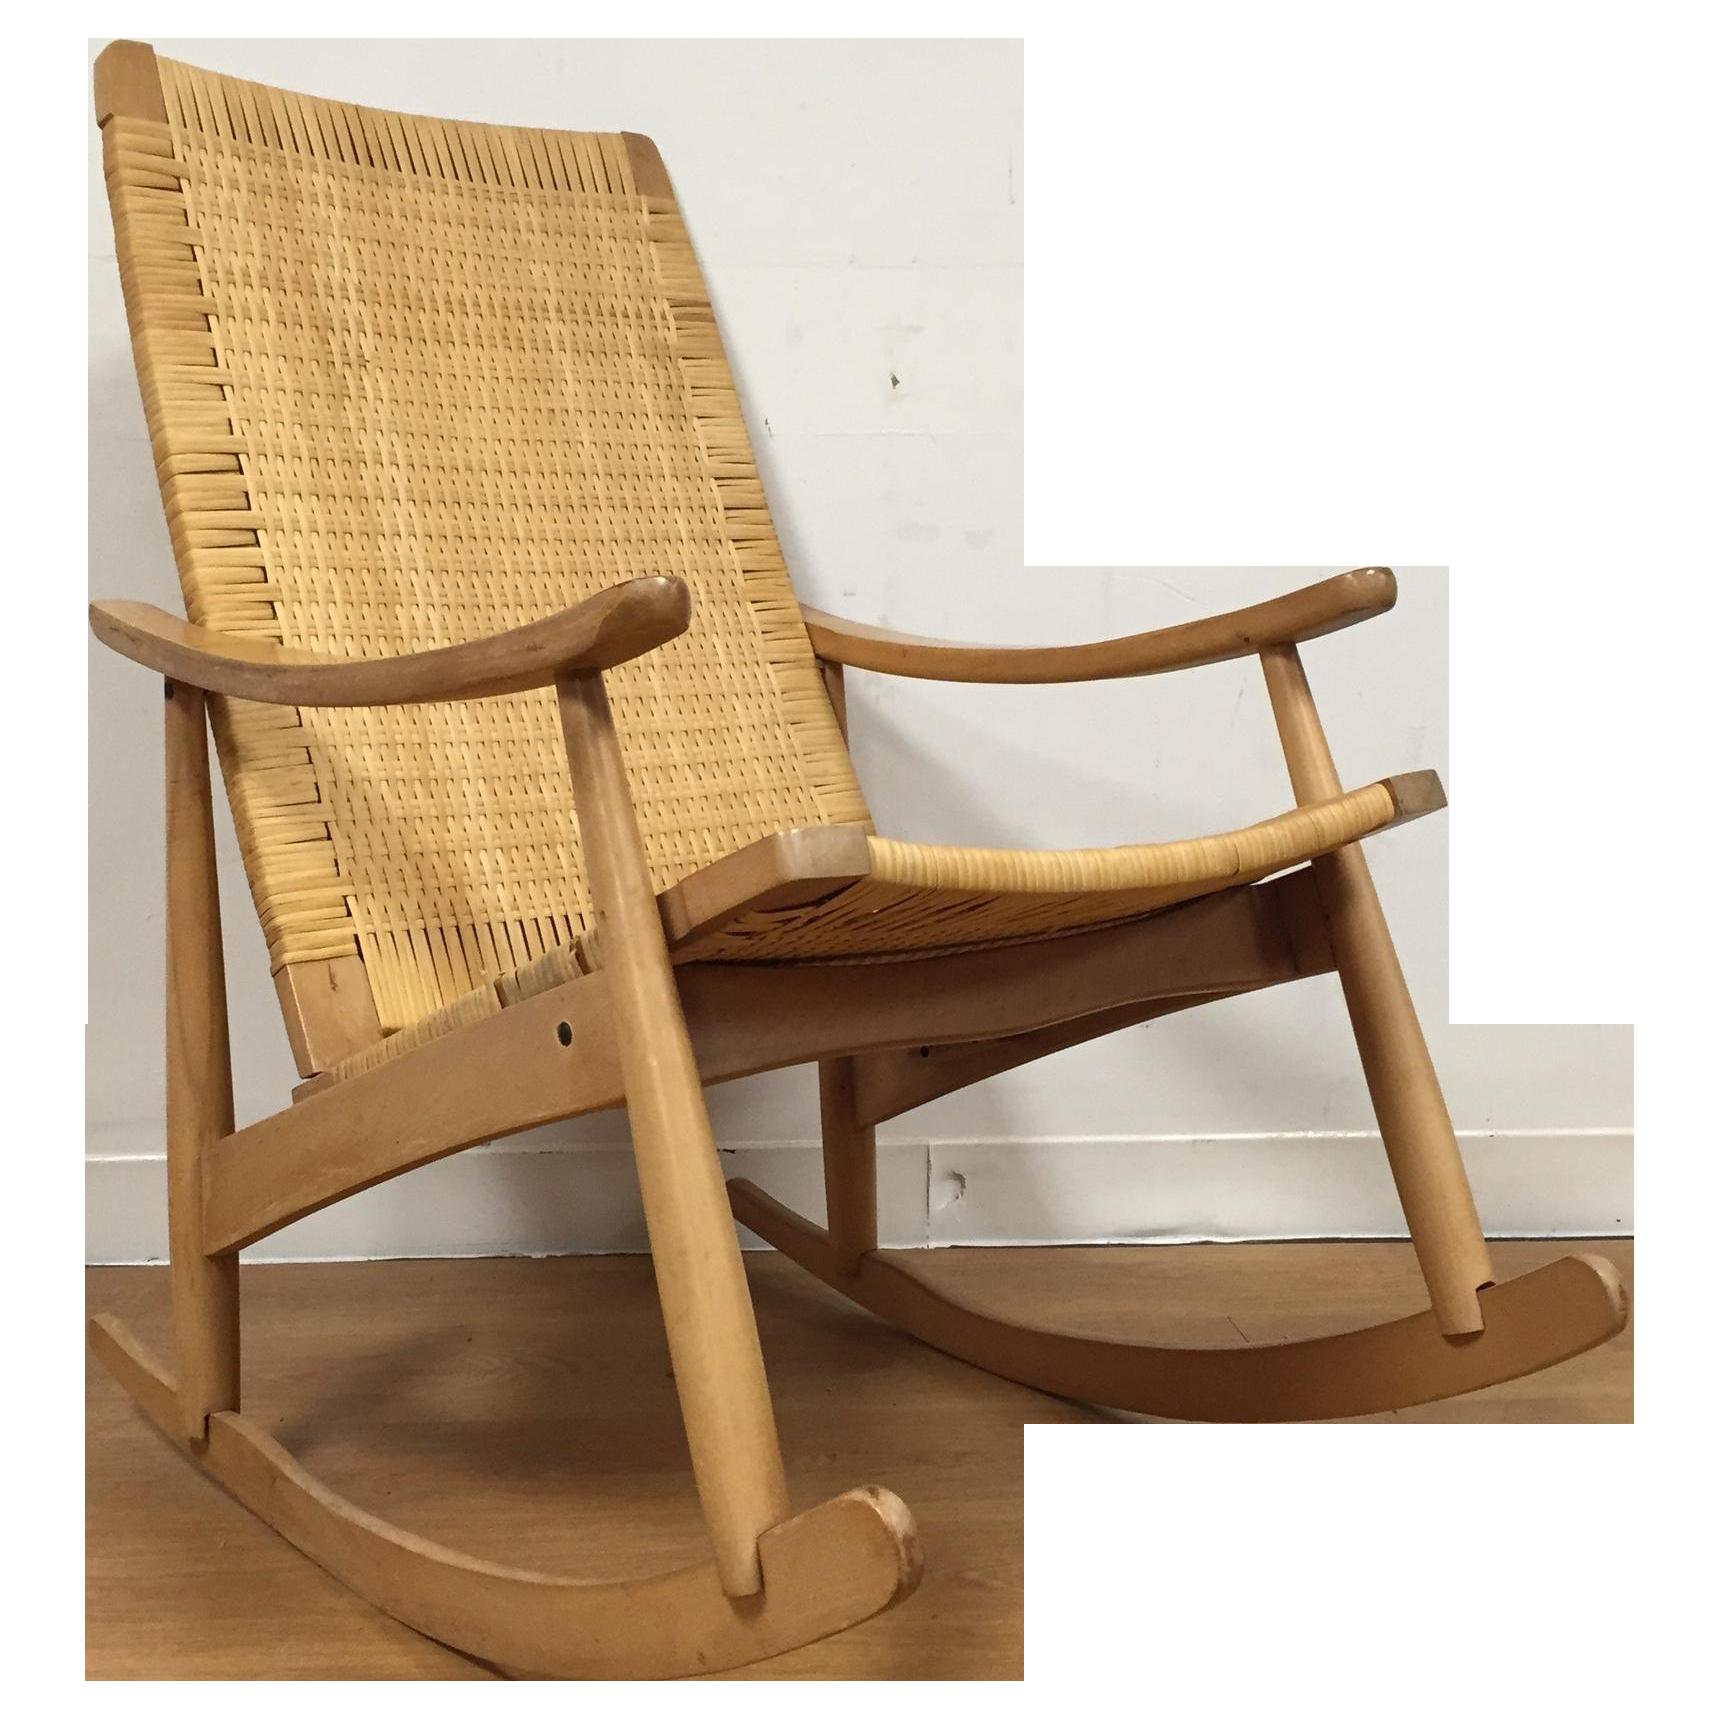 home fabric p christopher by mid rocking src braant century chair knight prod com ostkcdn